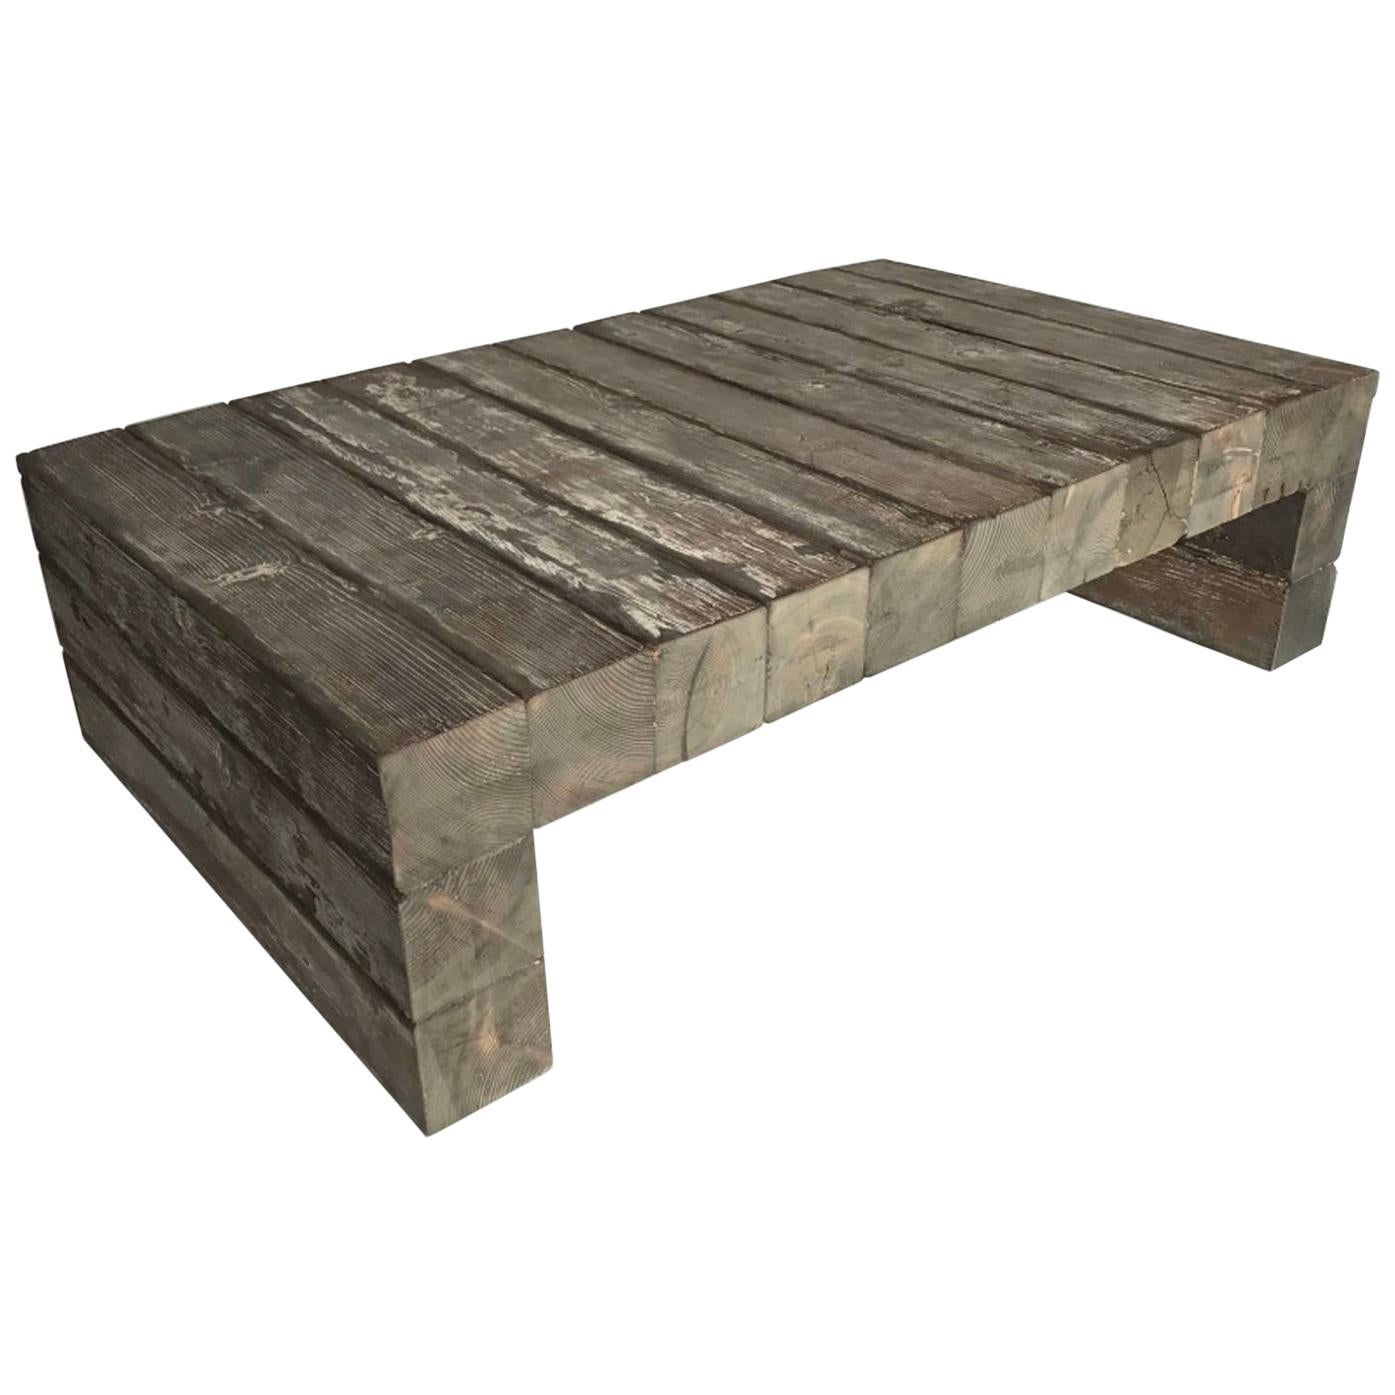 very rustic reclaimed wood coffee table